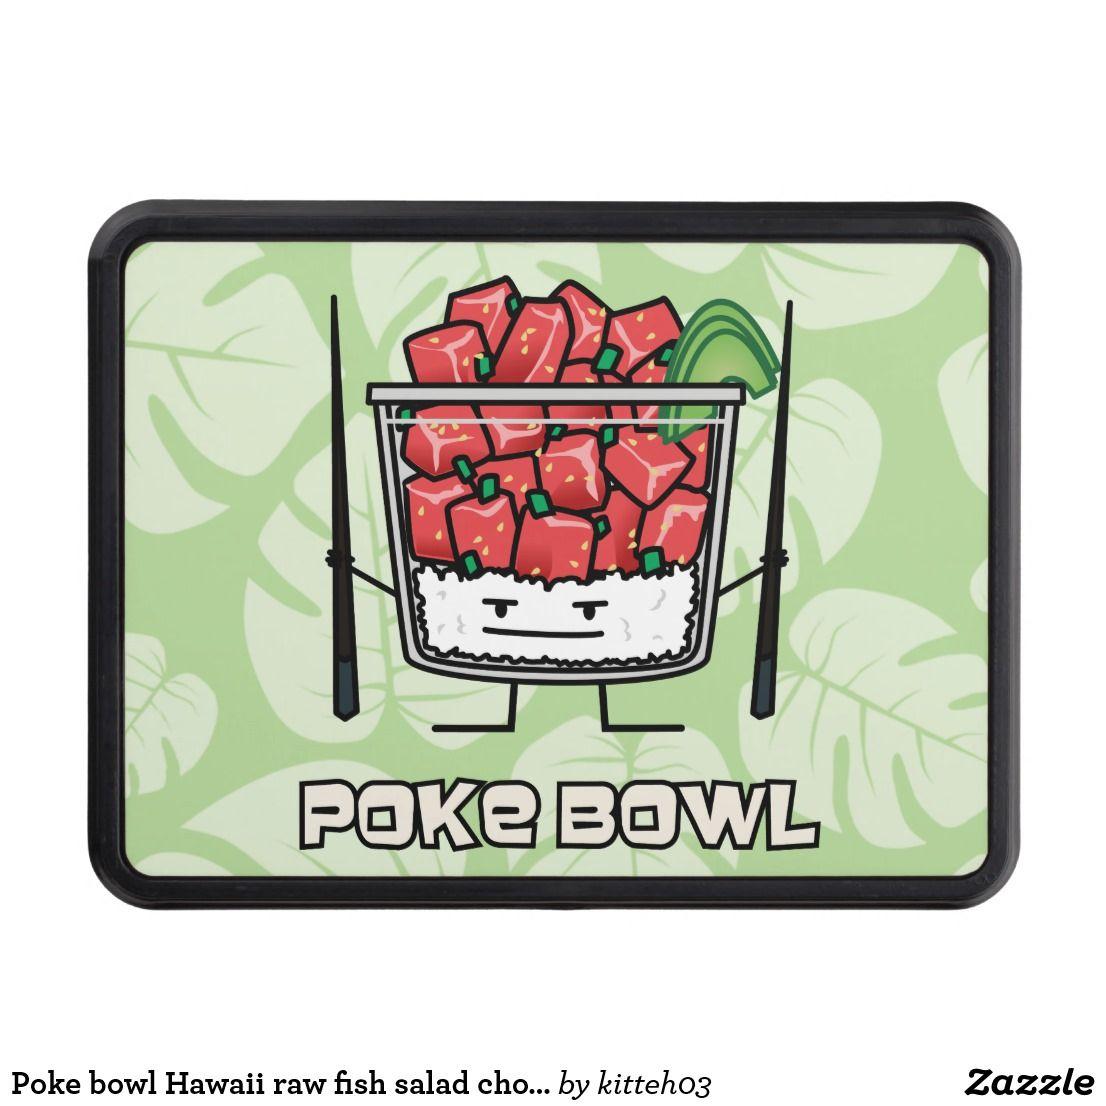 828c43c0dc5 Poke bowl Hawaii raw fish salad chopsticks aku Trailer Hitch Cover ...